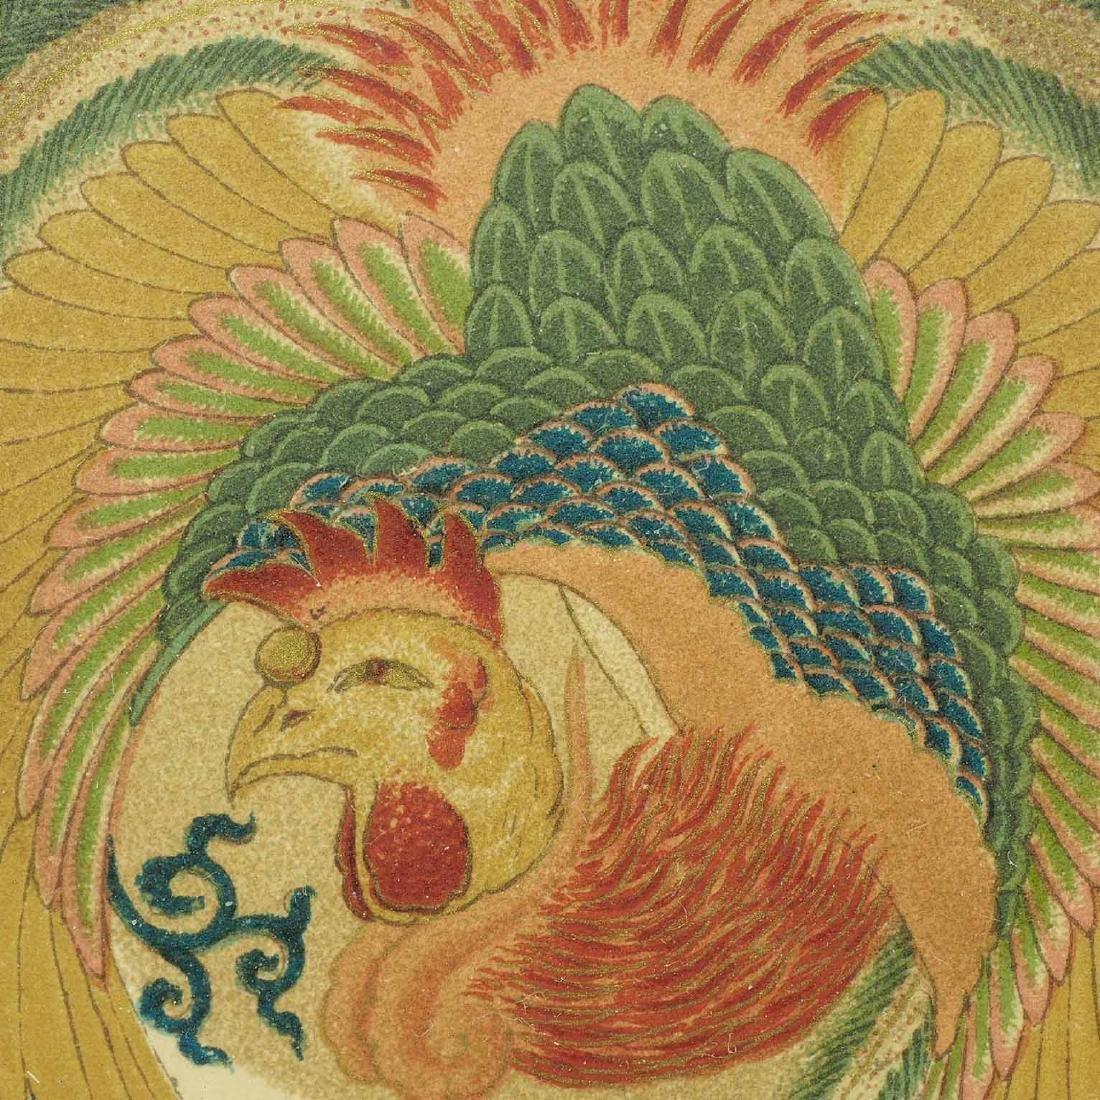 Satsouma, Ceramic Art of Japan, Lithograph by Firmin - 4